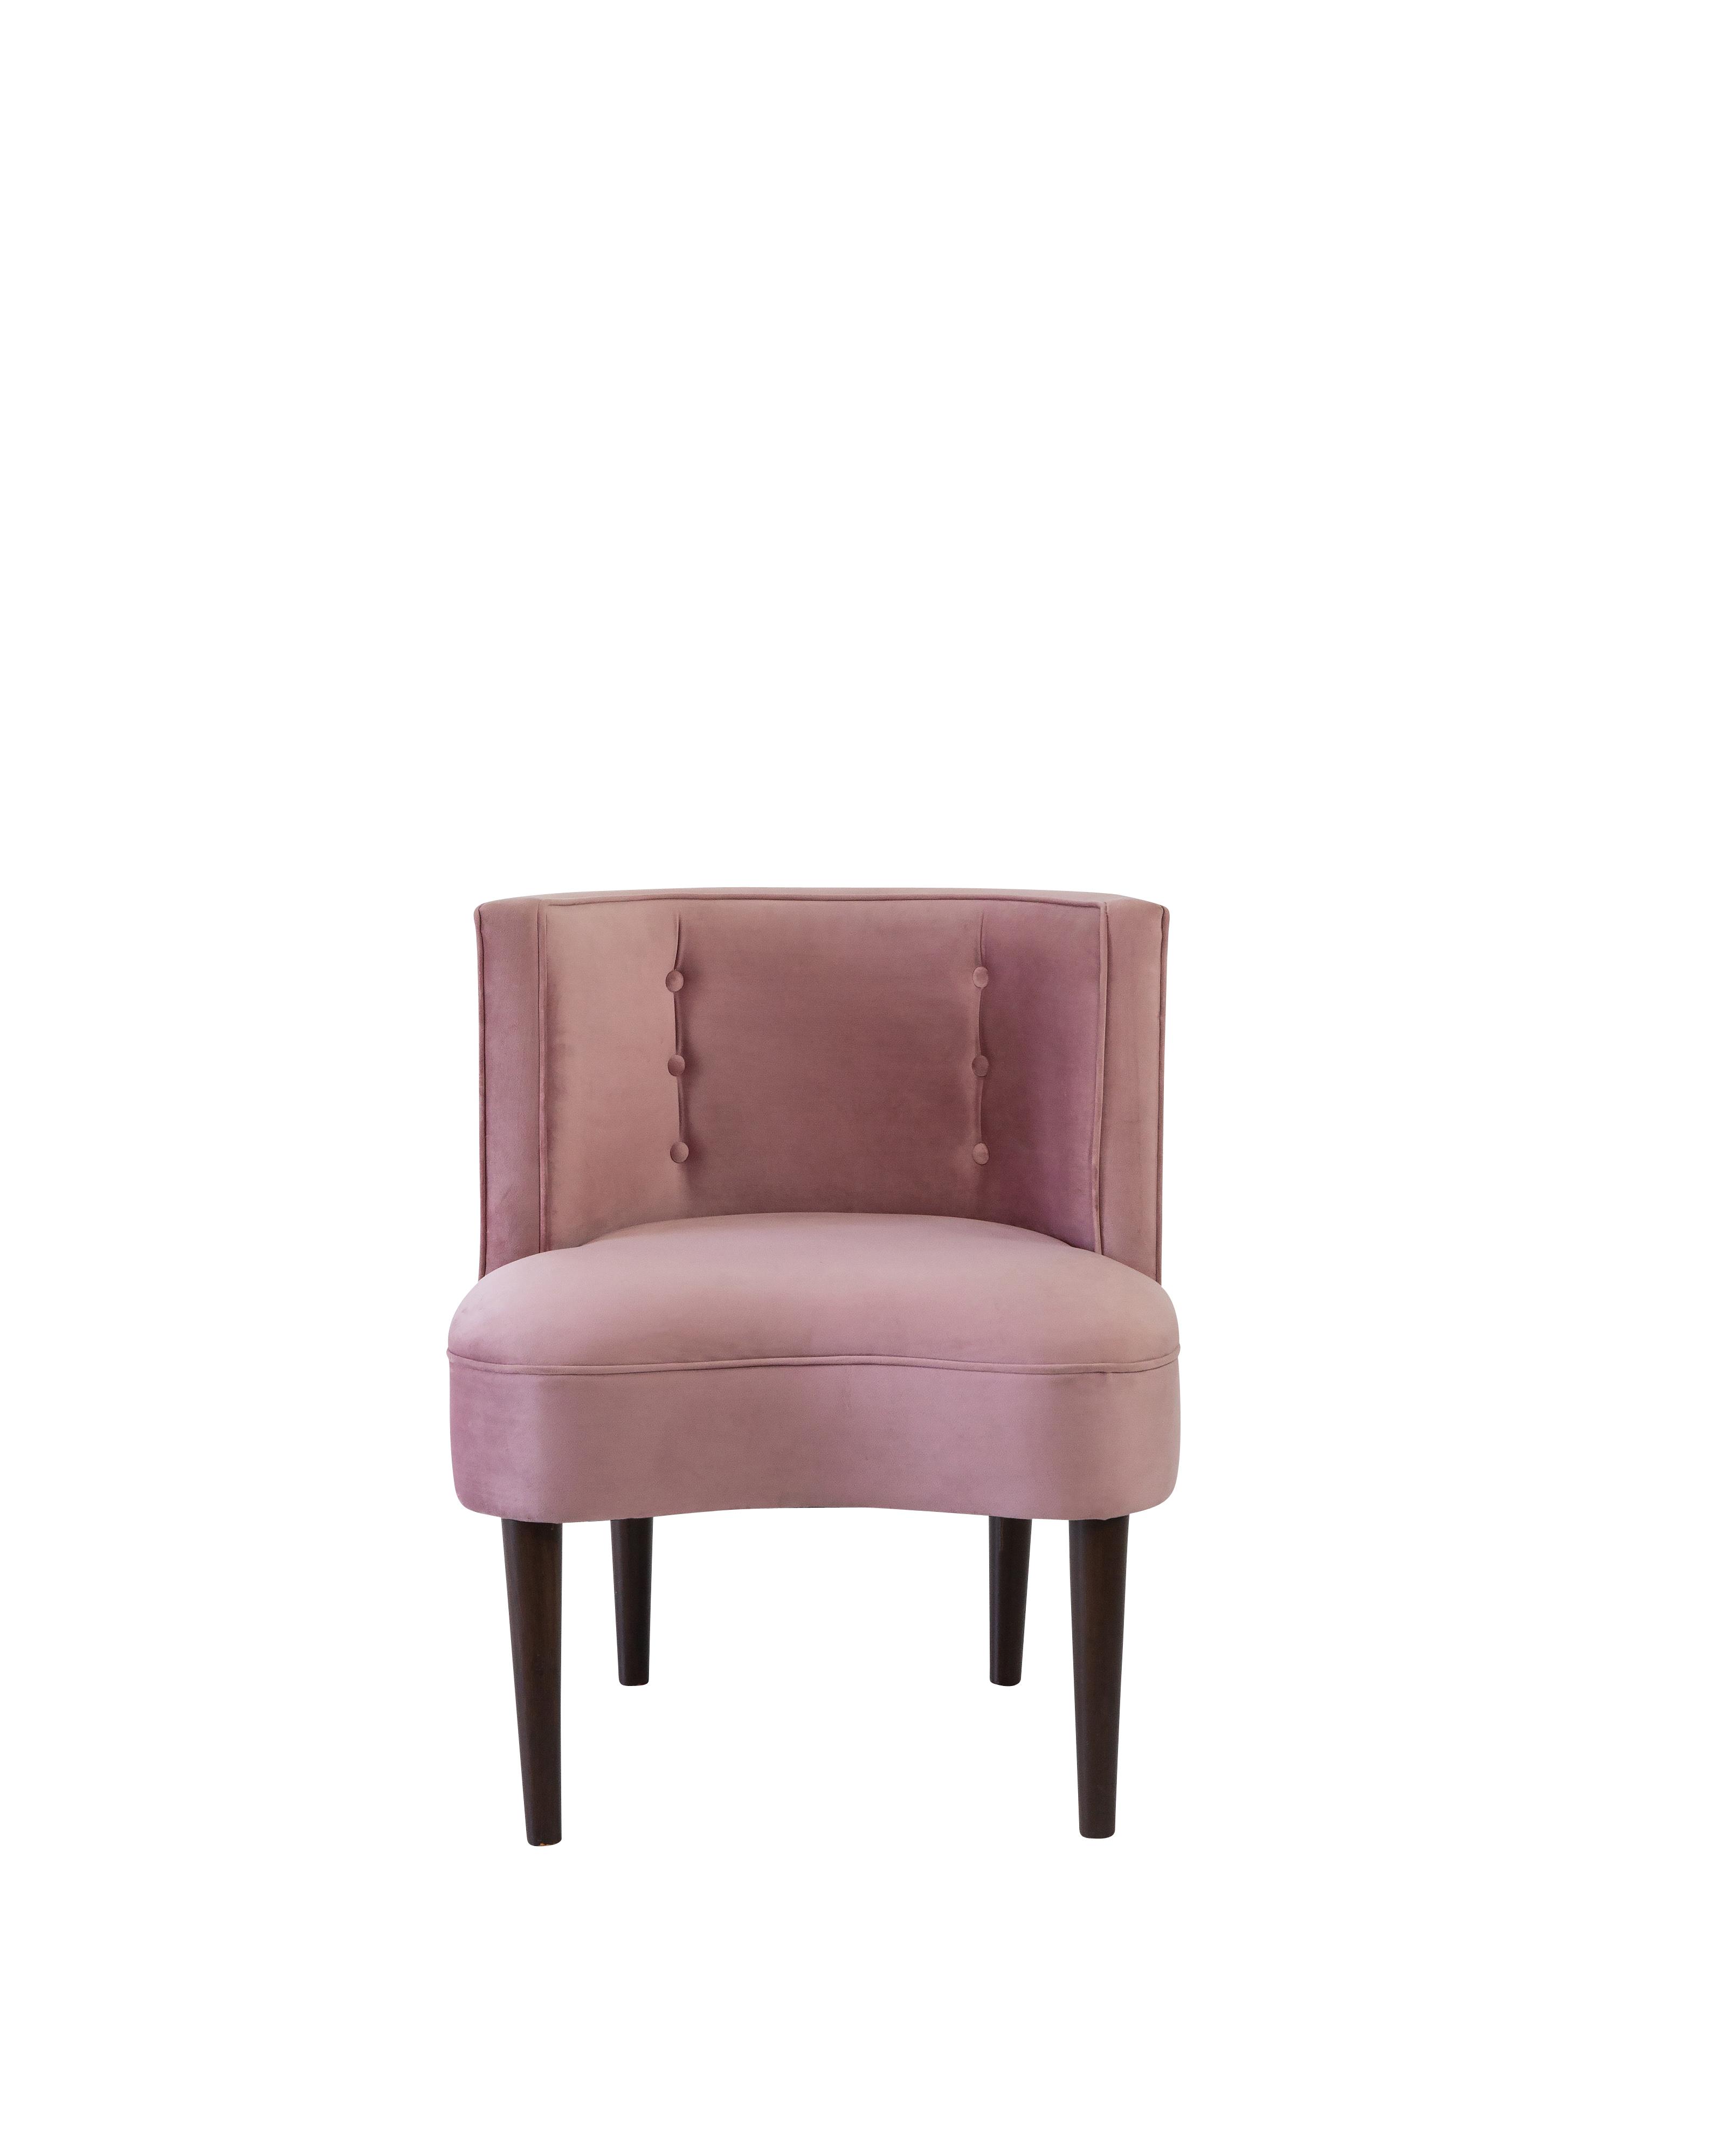 Erika Chair- Dusty Rose